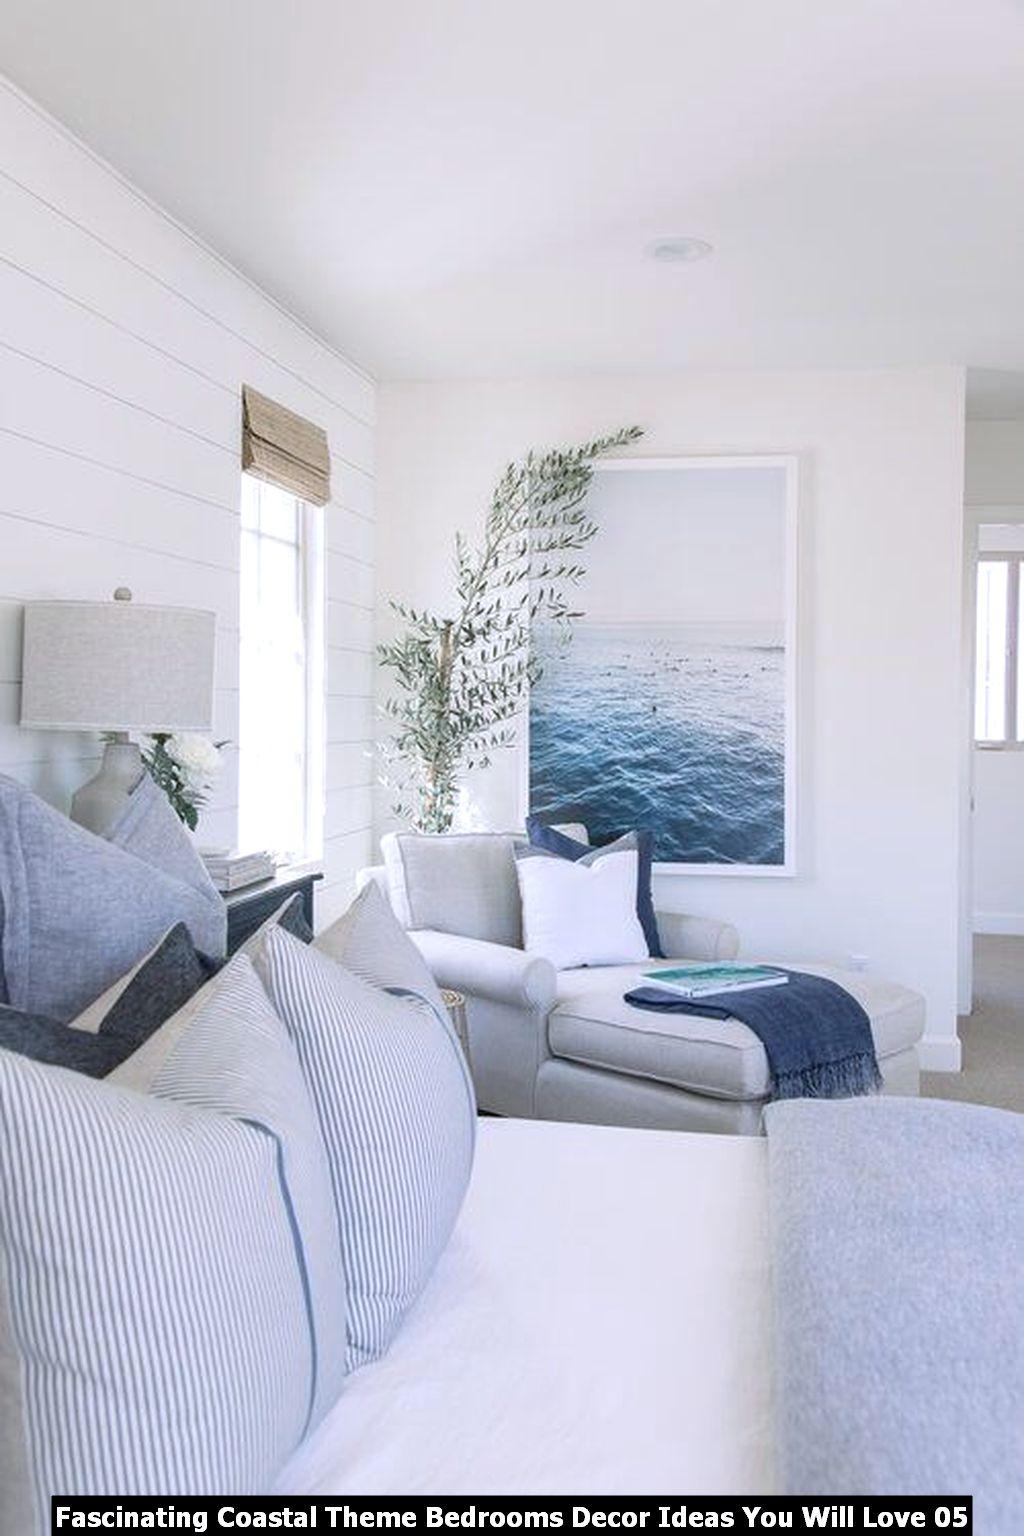 Fascinating Coastal Theme Bedrooms Decor Ideas You Will Love 05